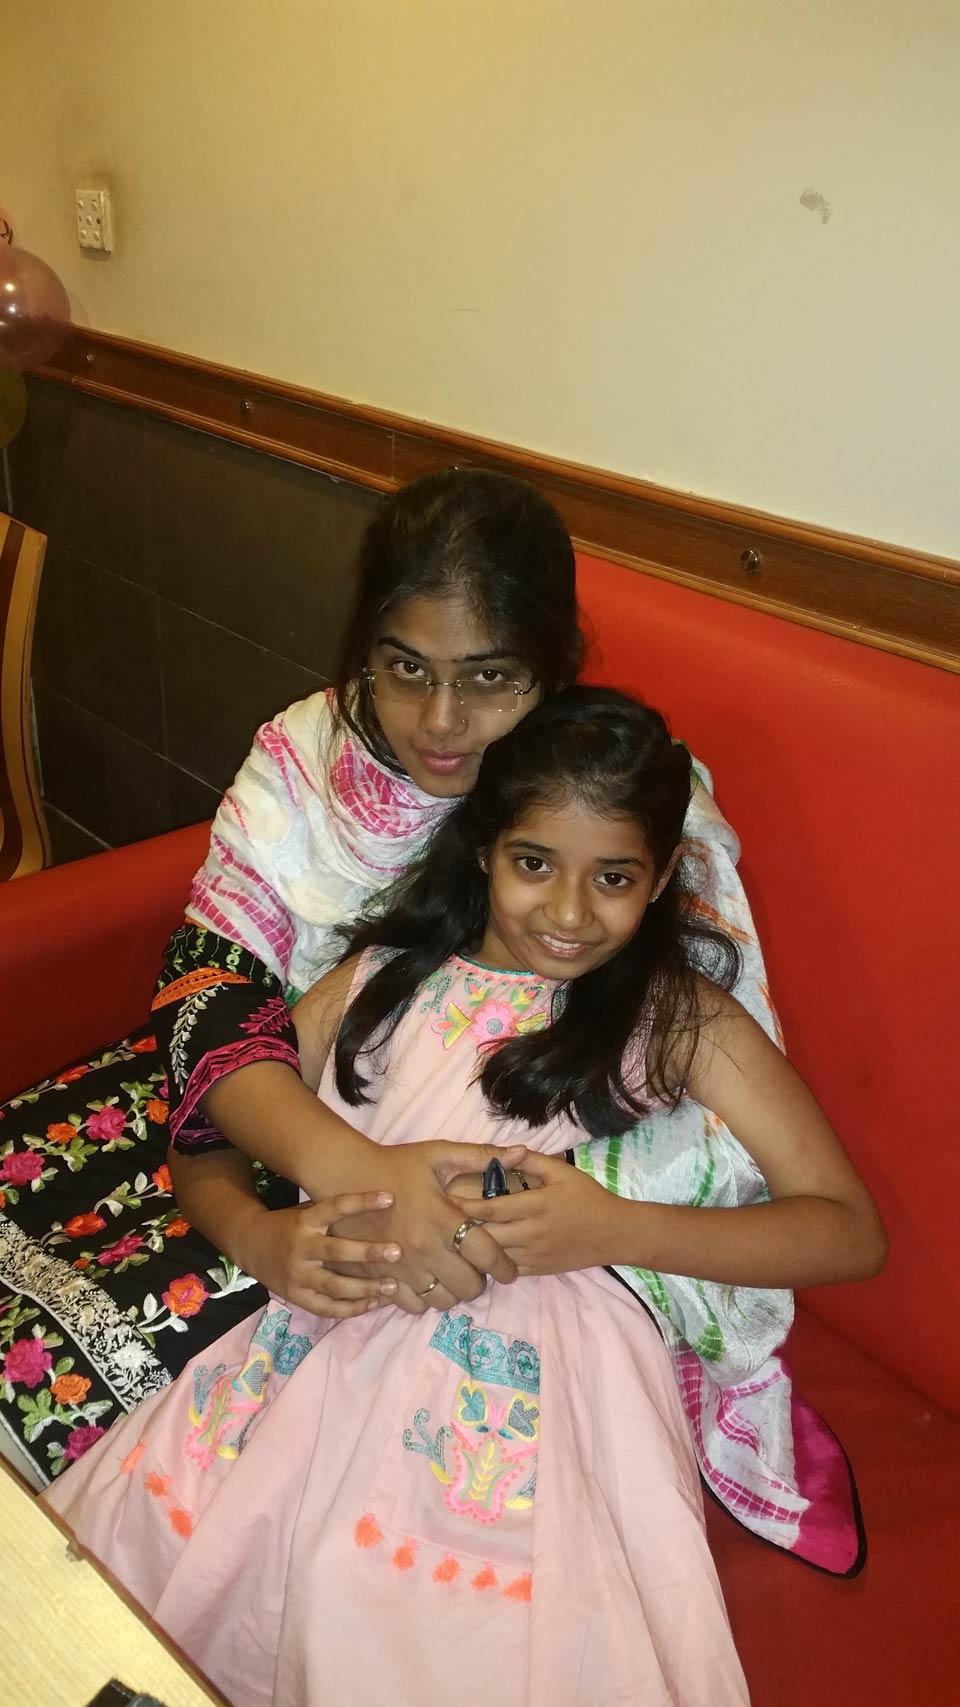 Zara Imran with her aunt Bushra Irshad